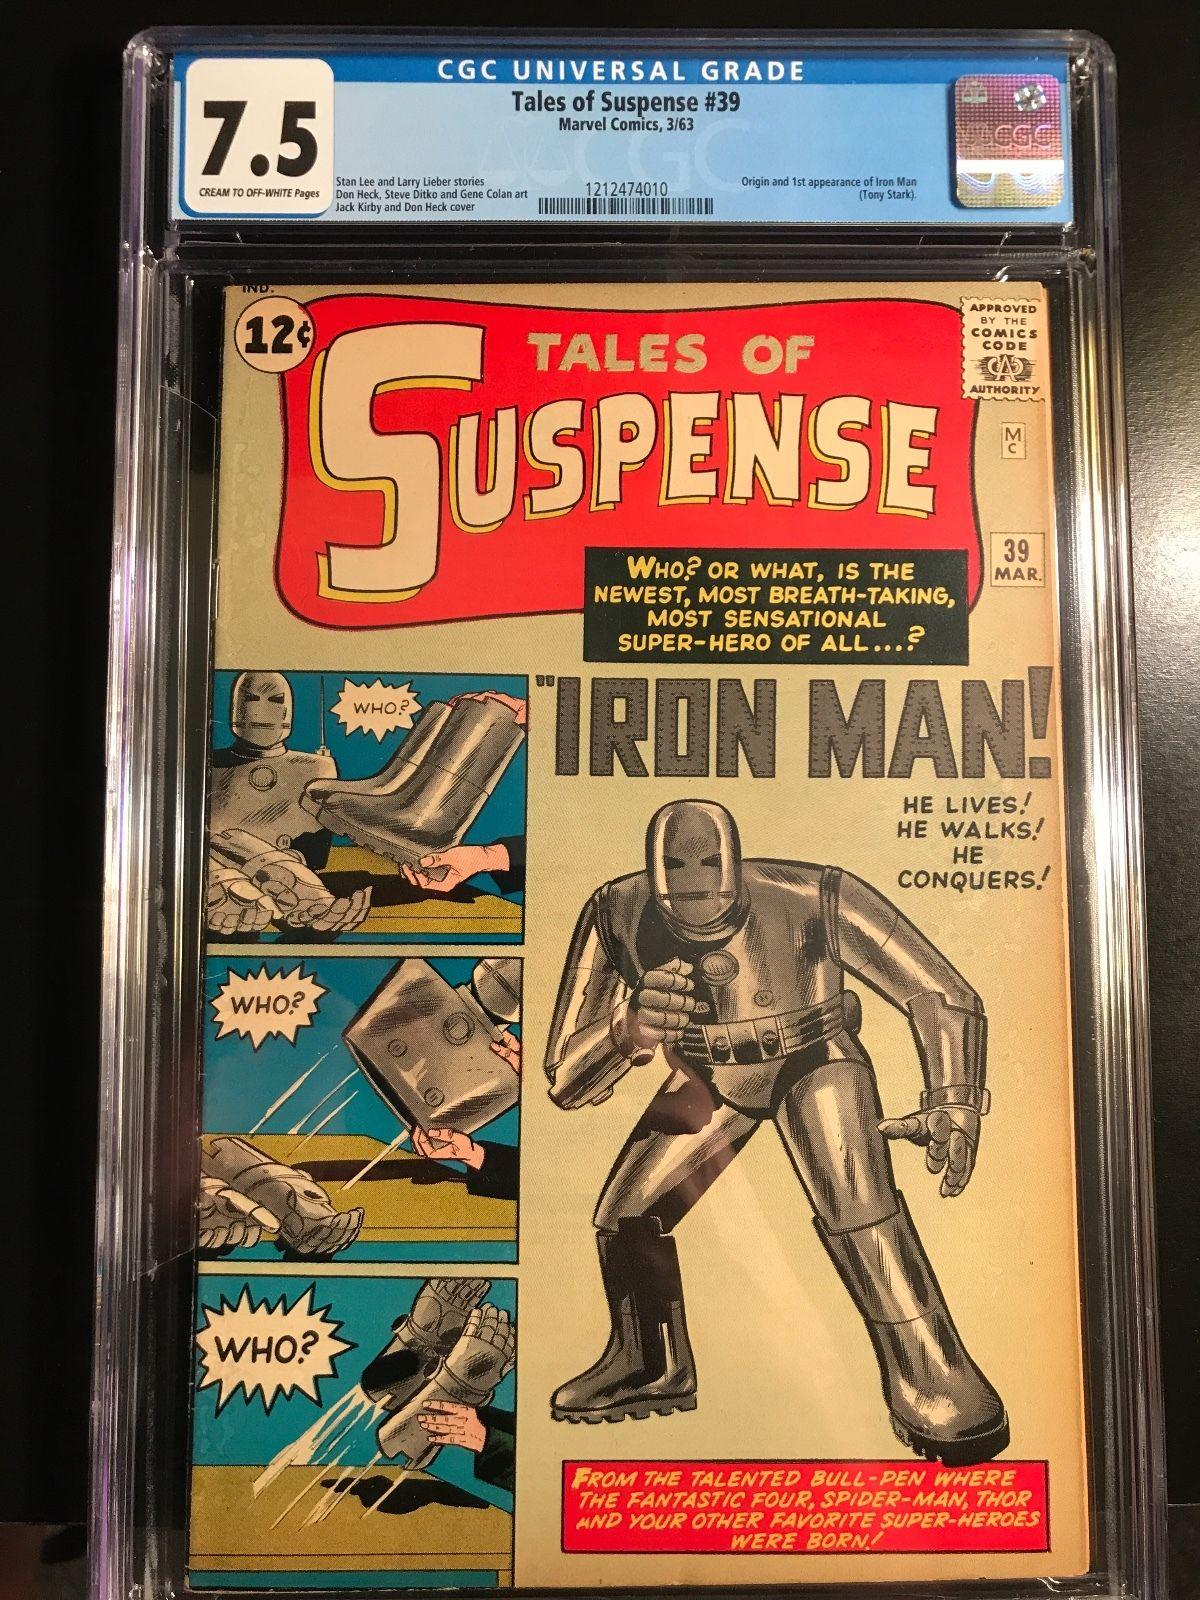 Tales of Suspense #39 (Mar 1963, Marvel) CGC grades 7.5 unrestored blue label